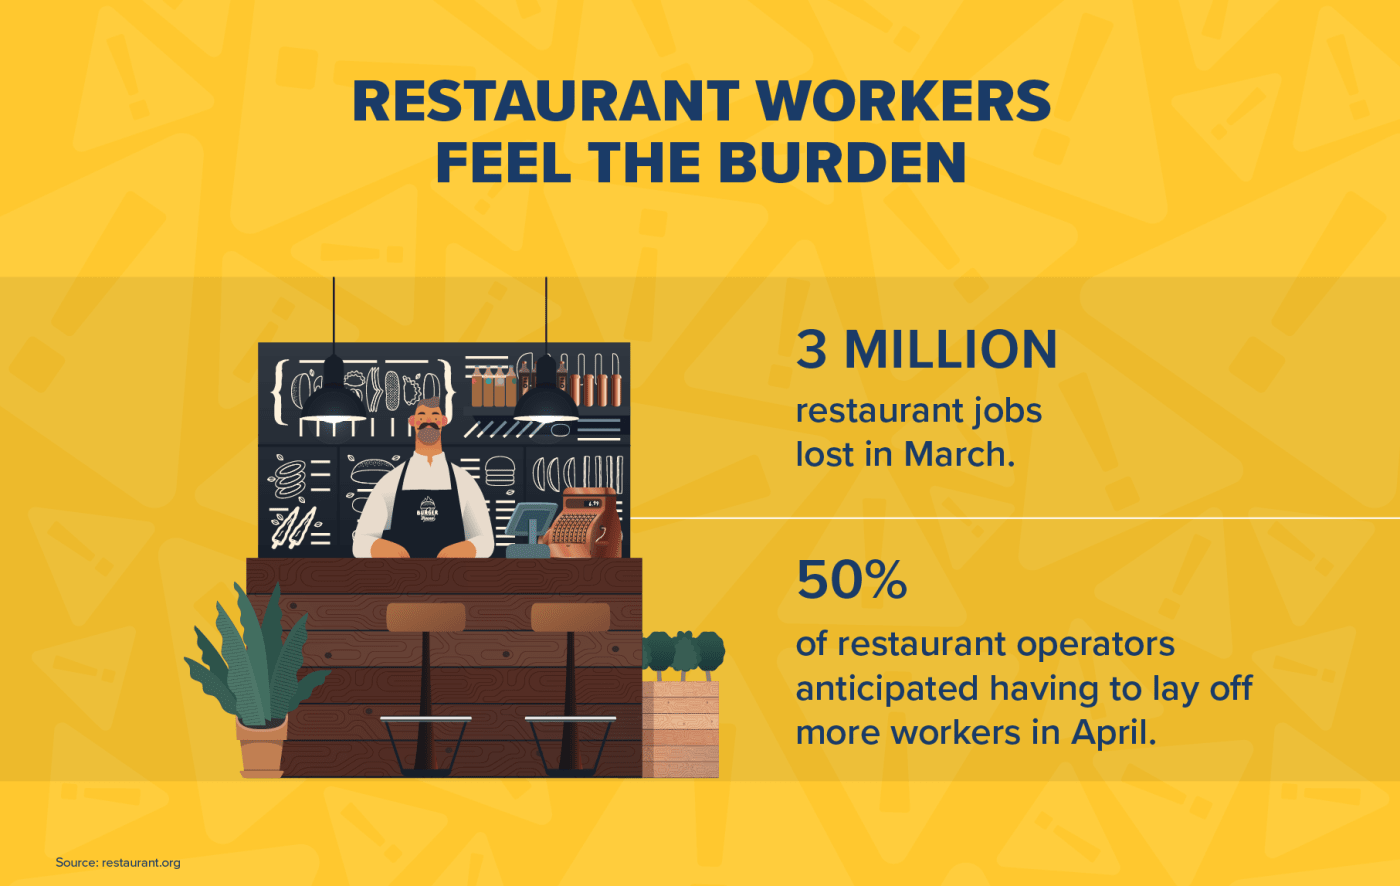 Restaurant Workers Feel the Burdern